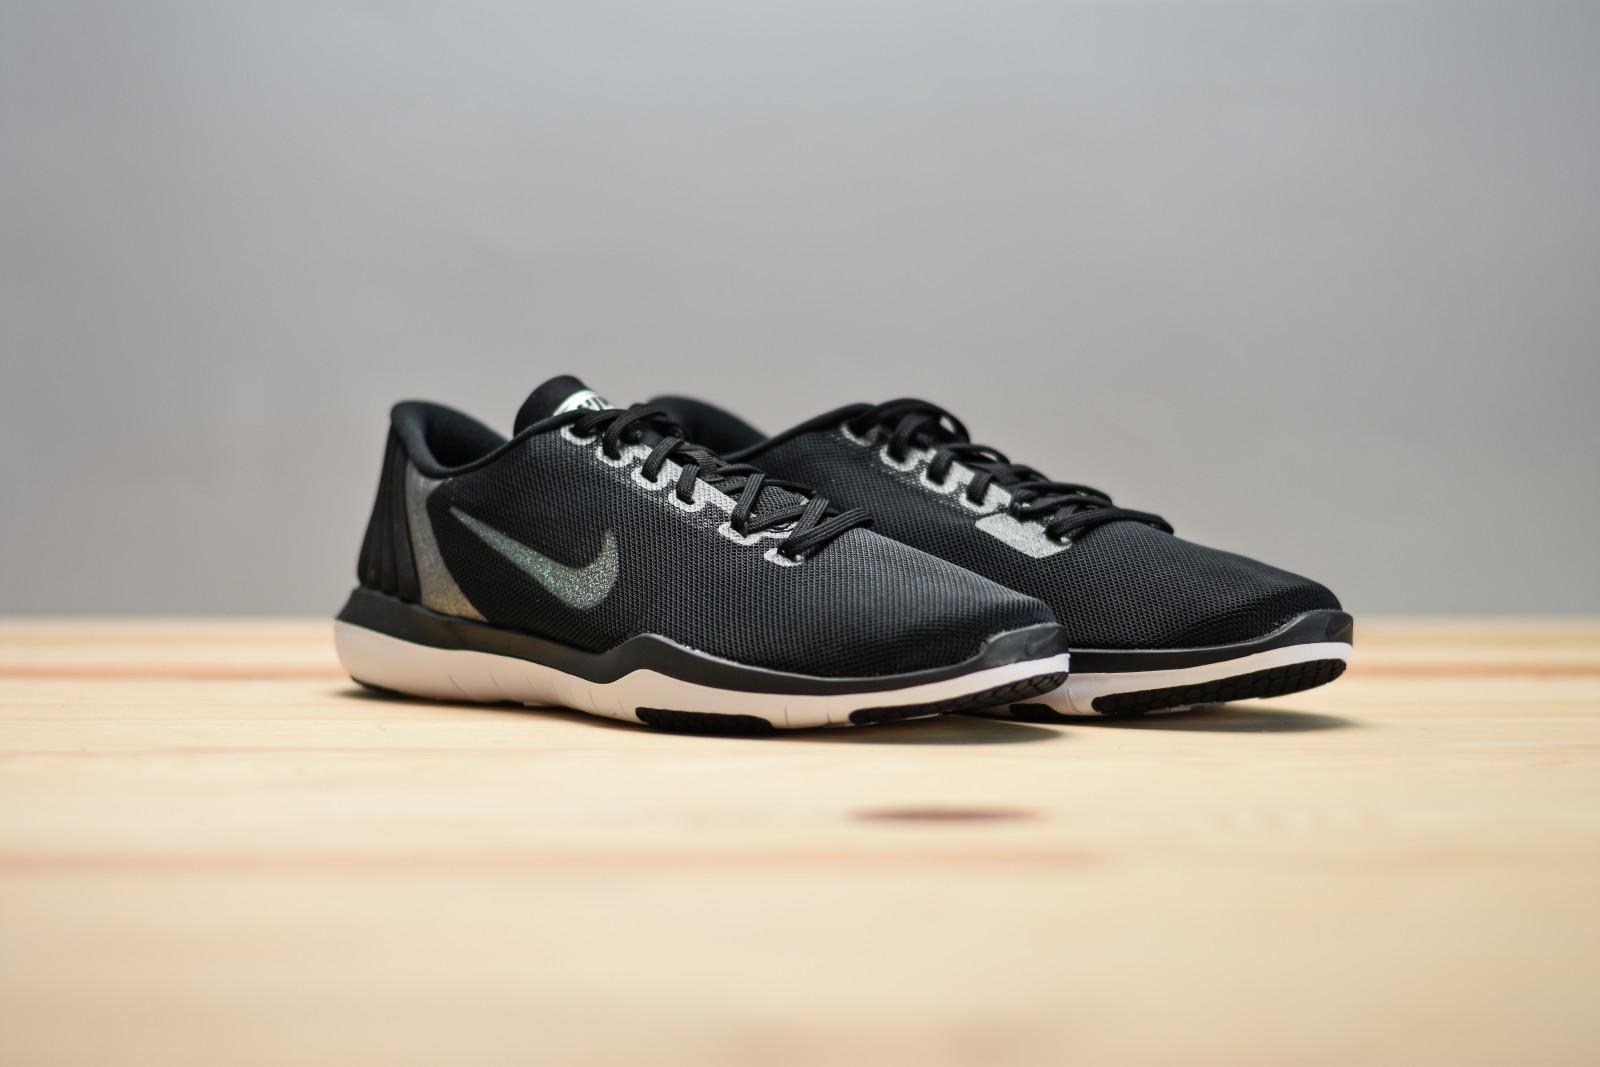 31c6637bd76 Dámská fitness obuv Nike W FLEX SUPREME TR 5 MTLC